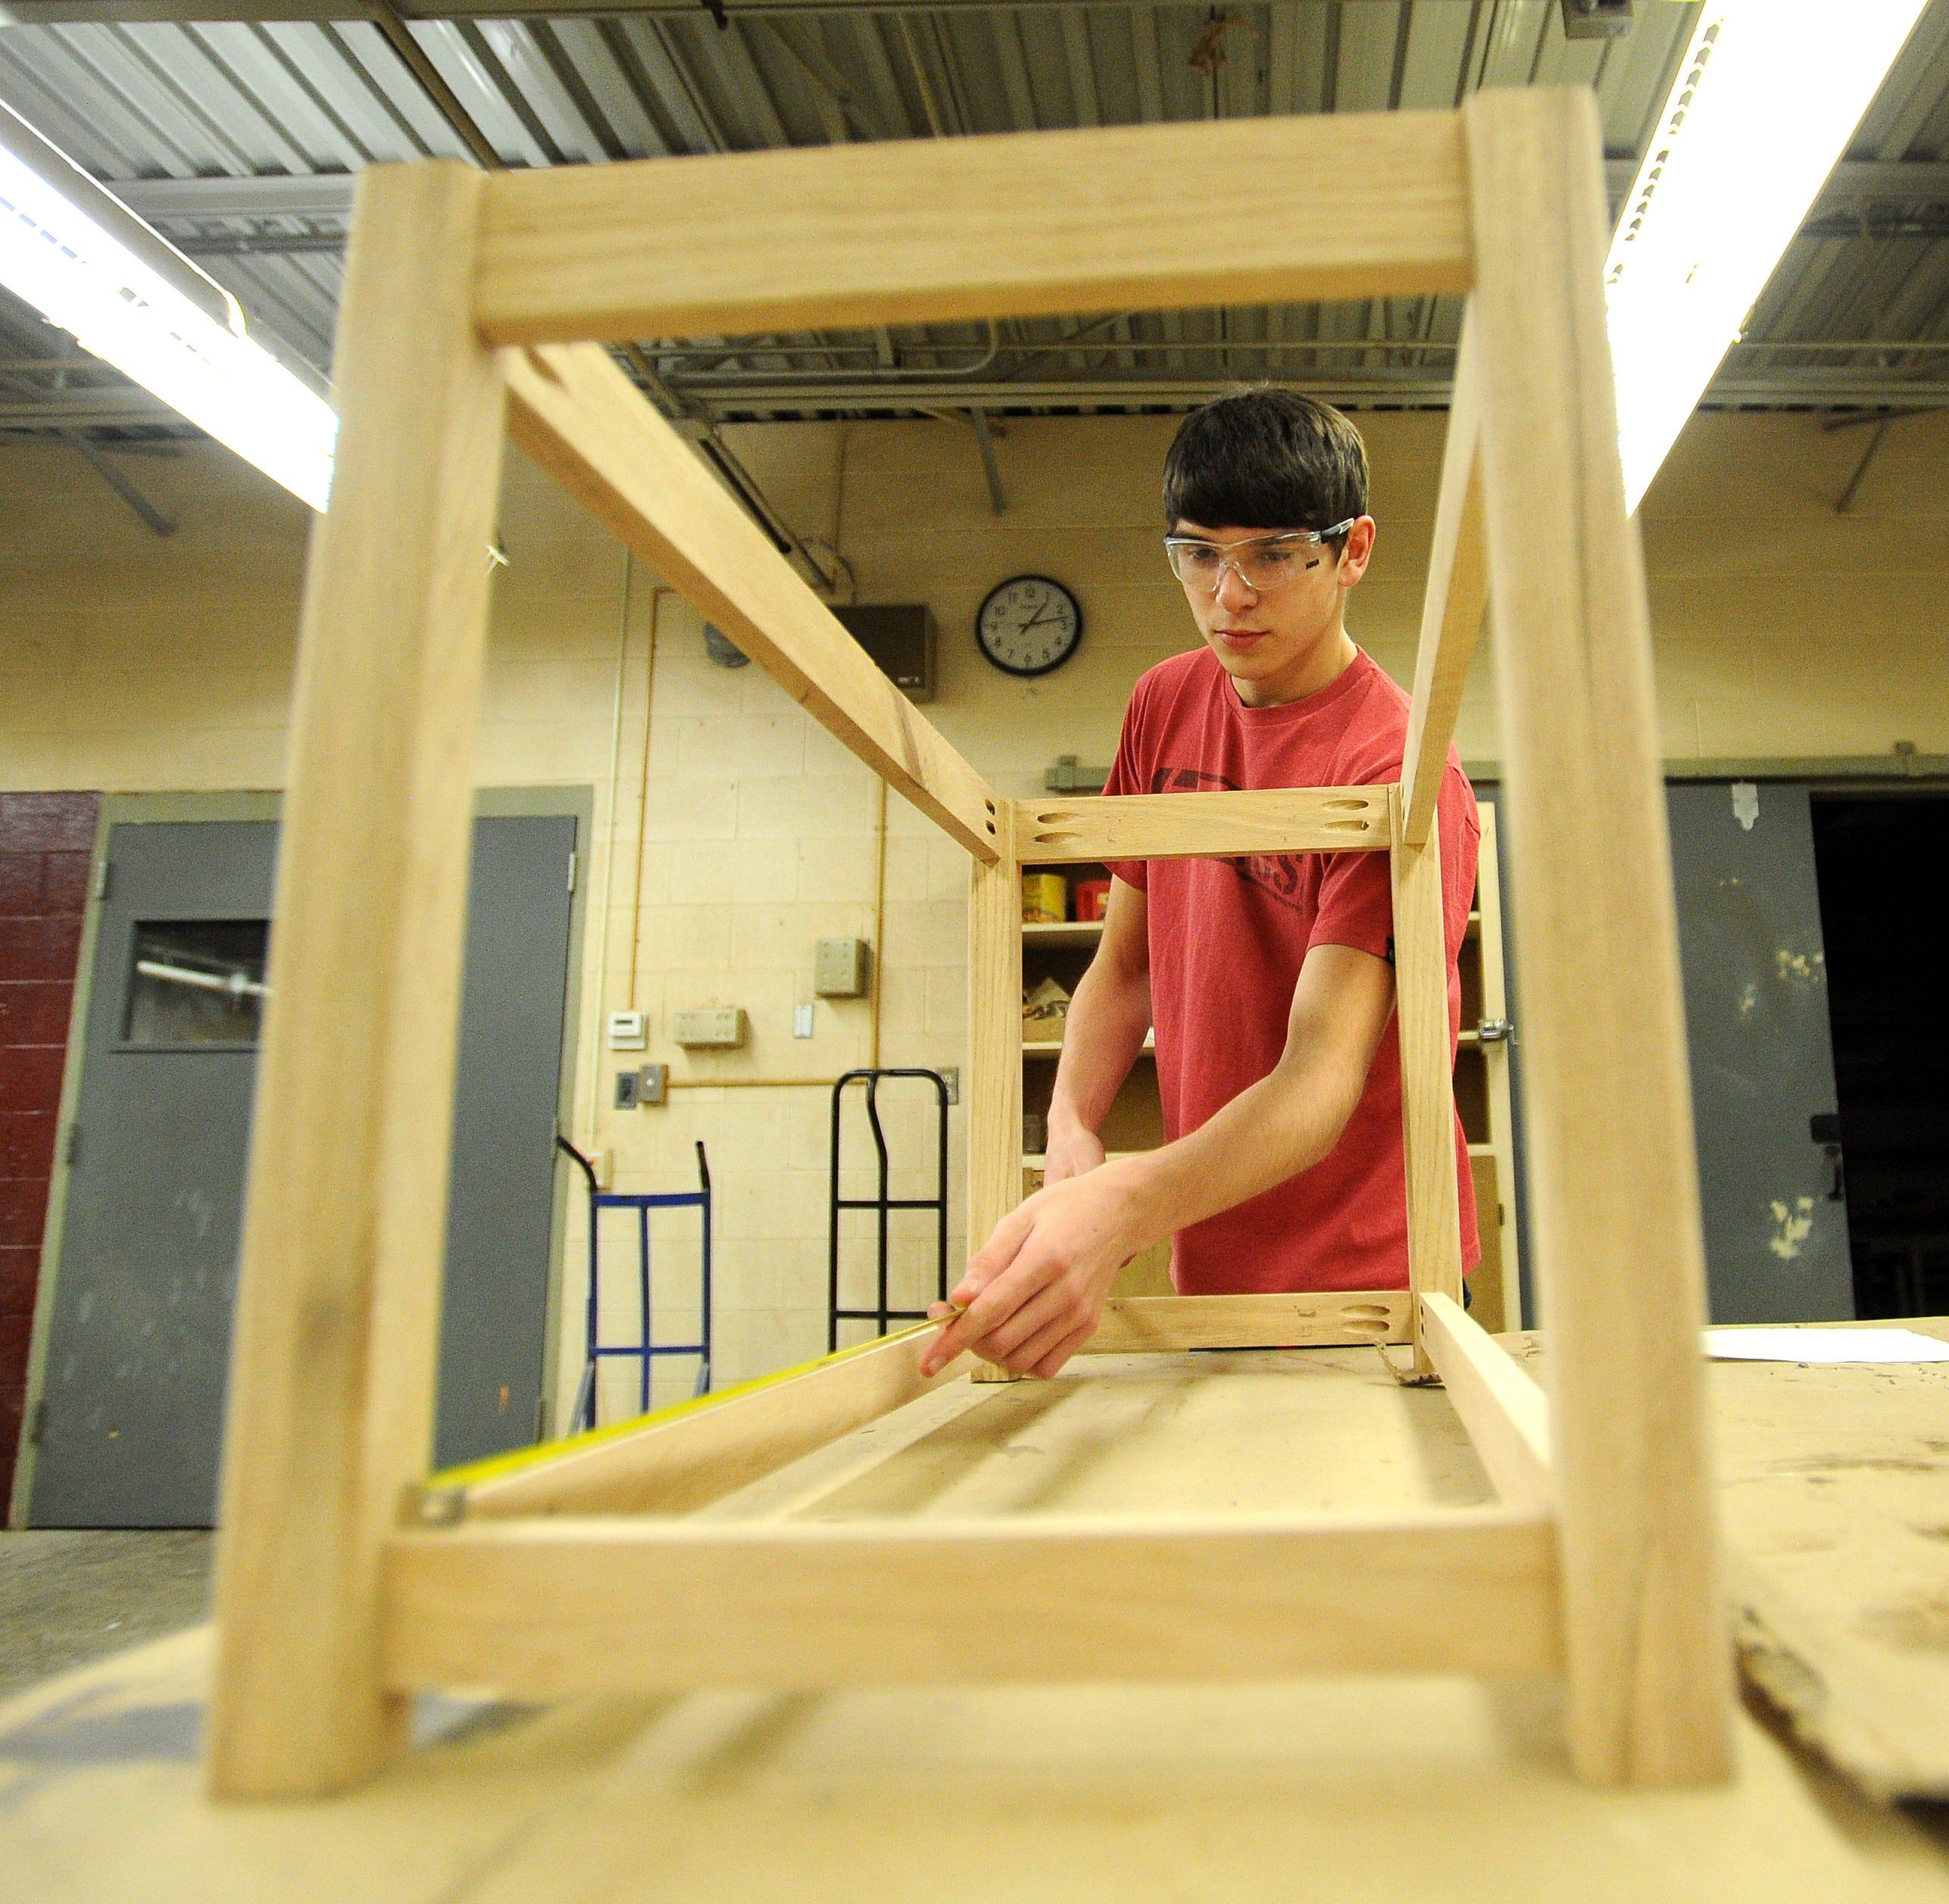 Job employability starts in high school